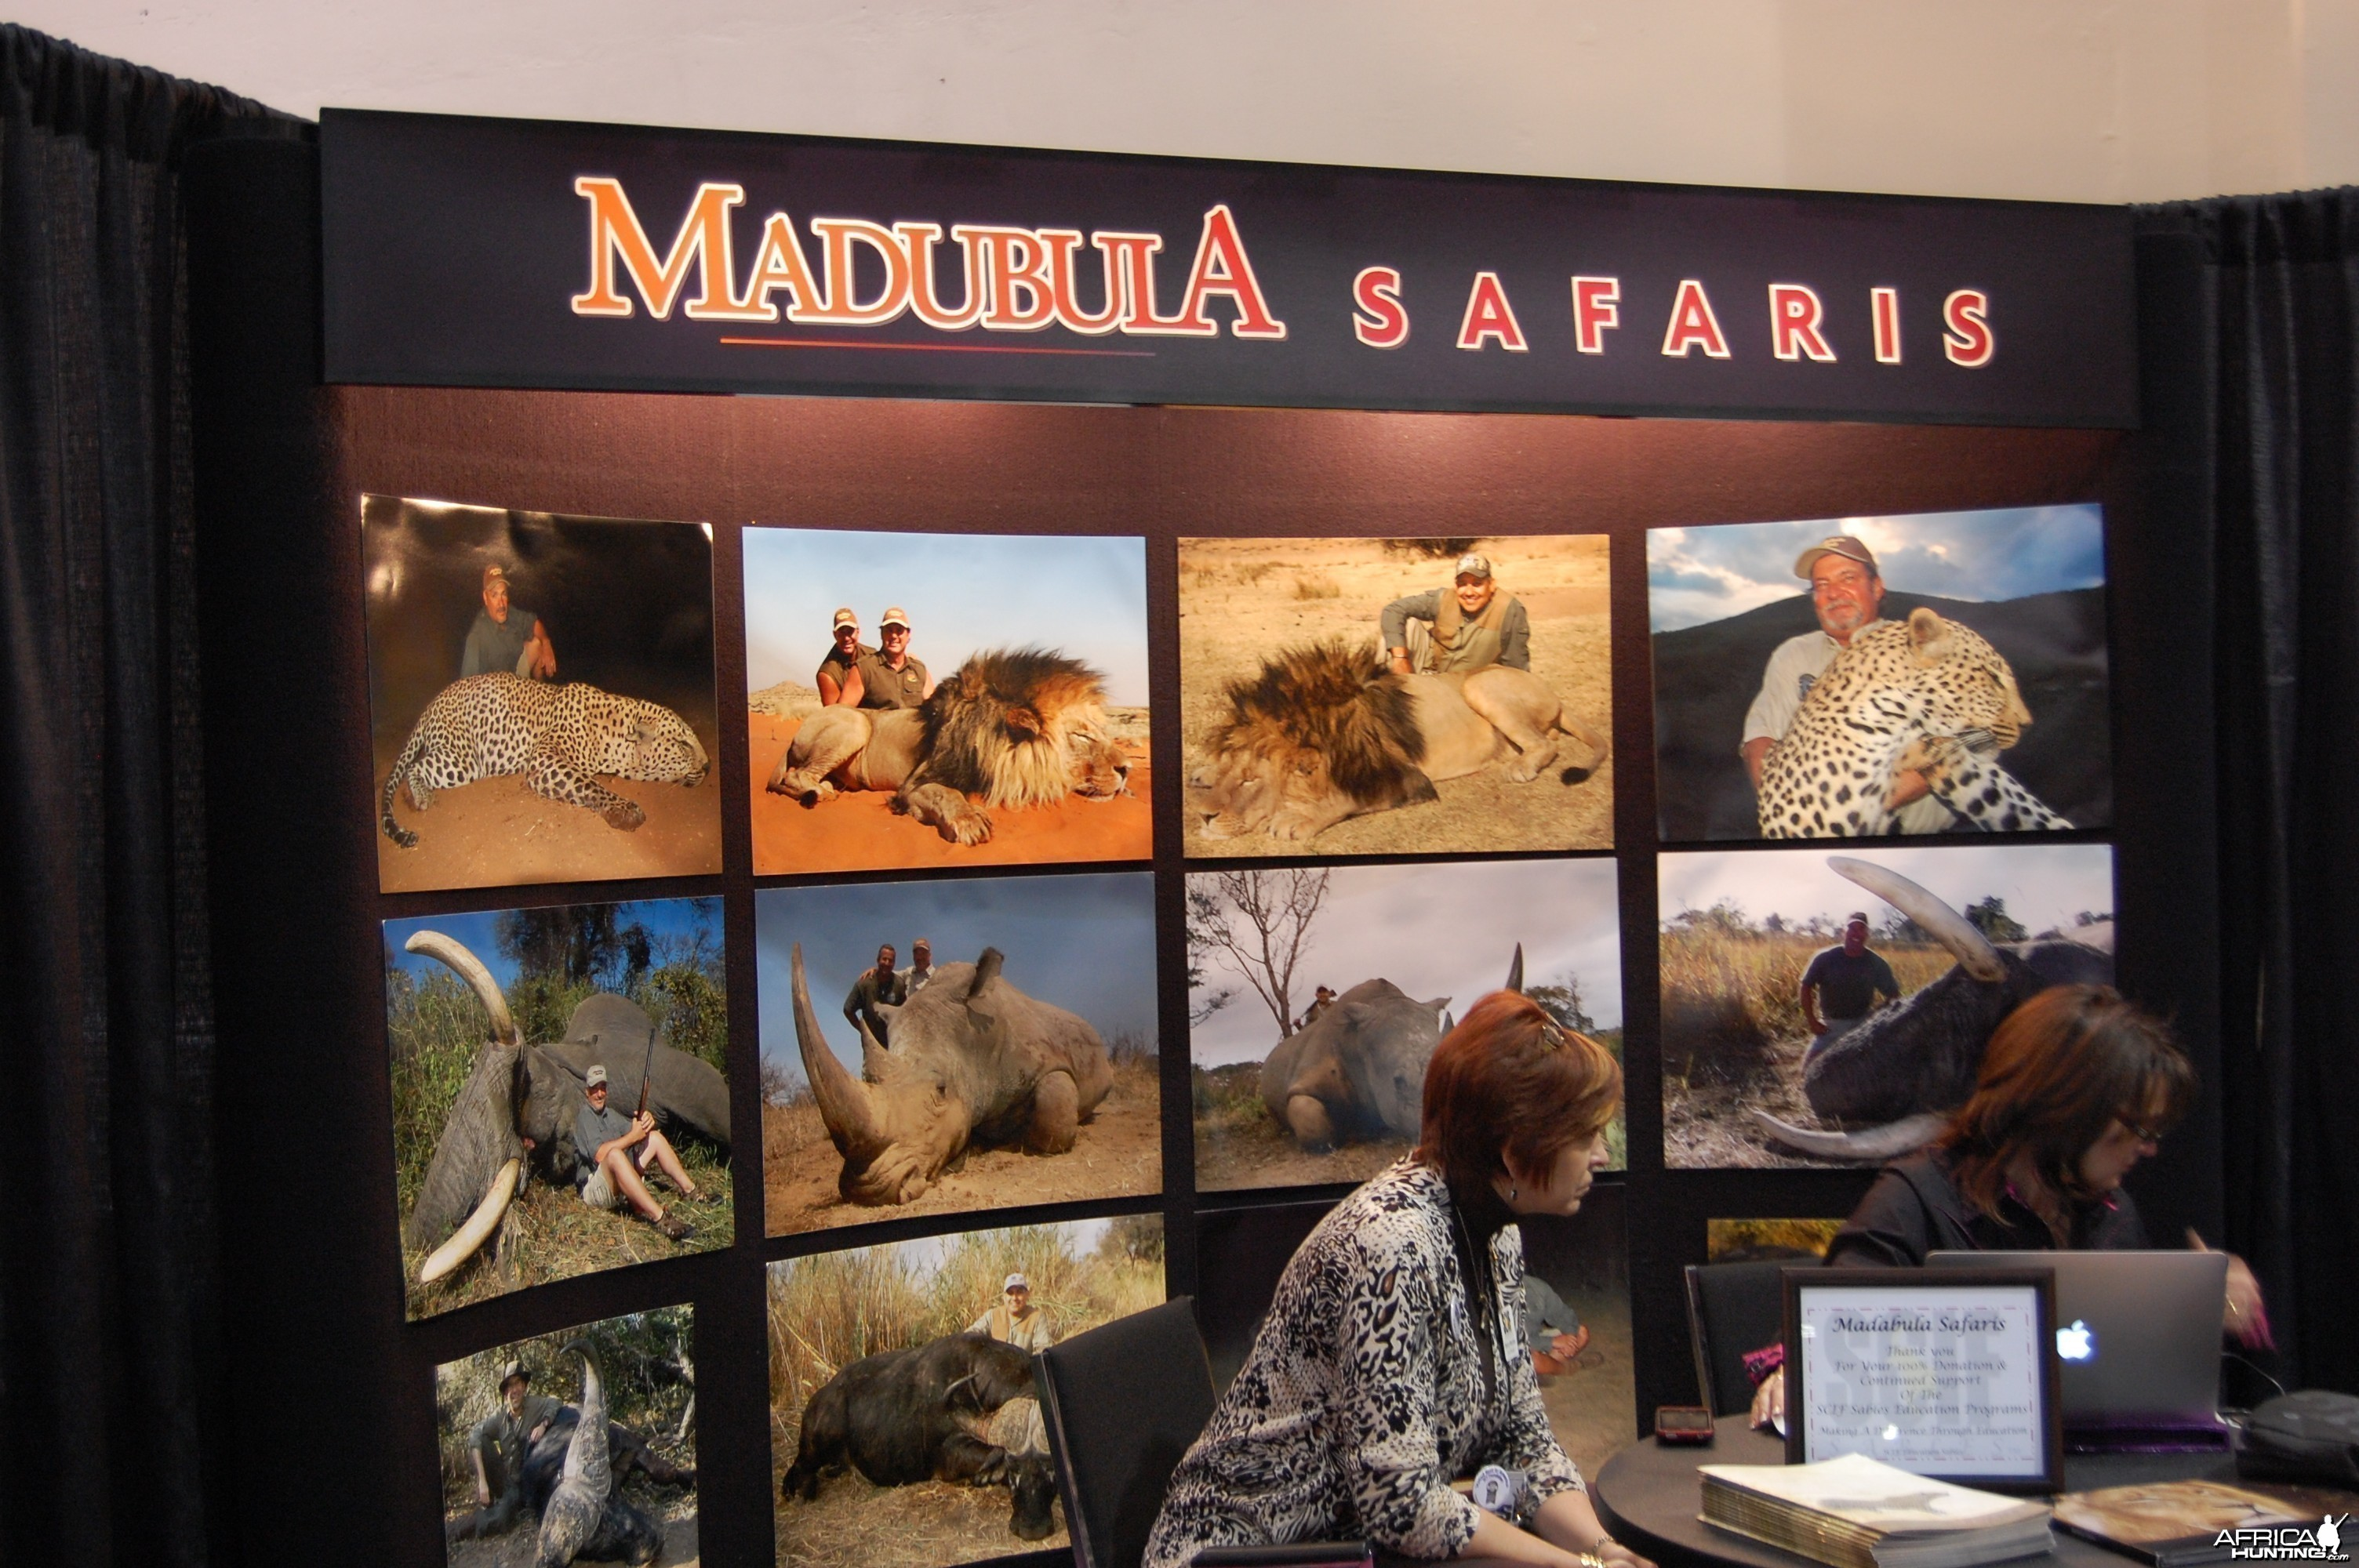 Mabudula Safaris